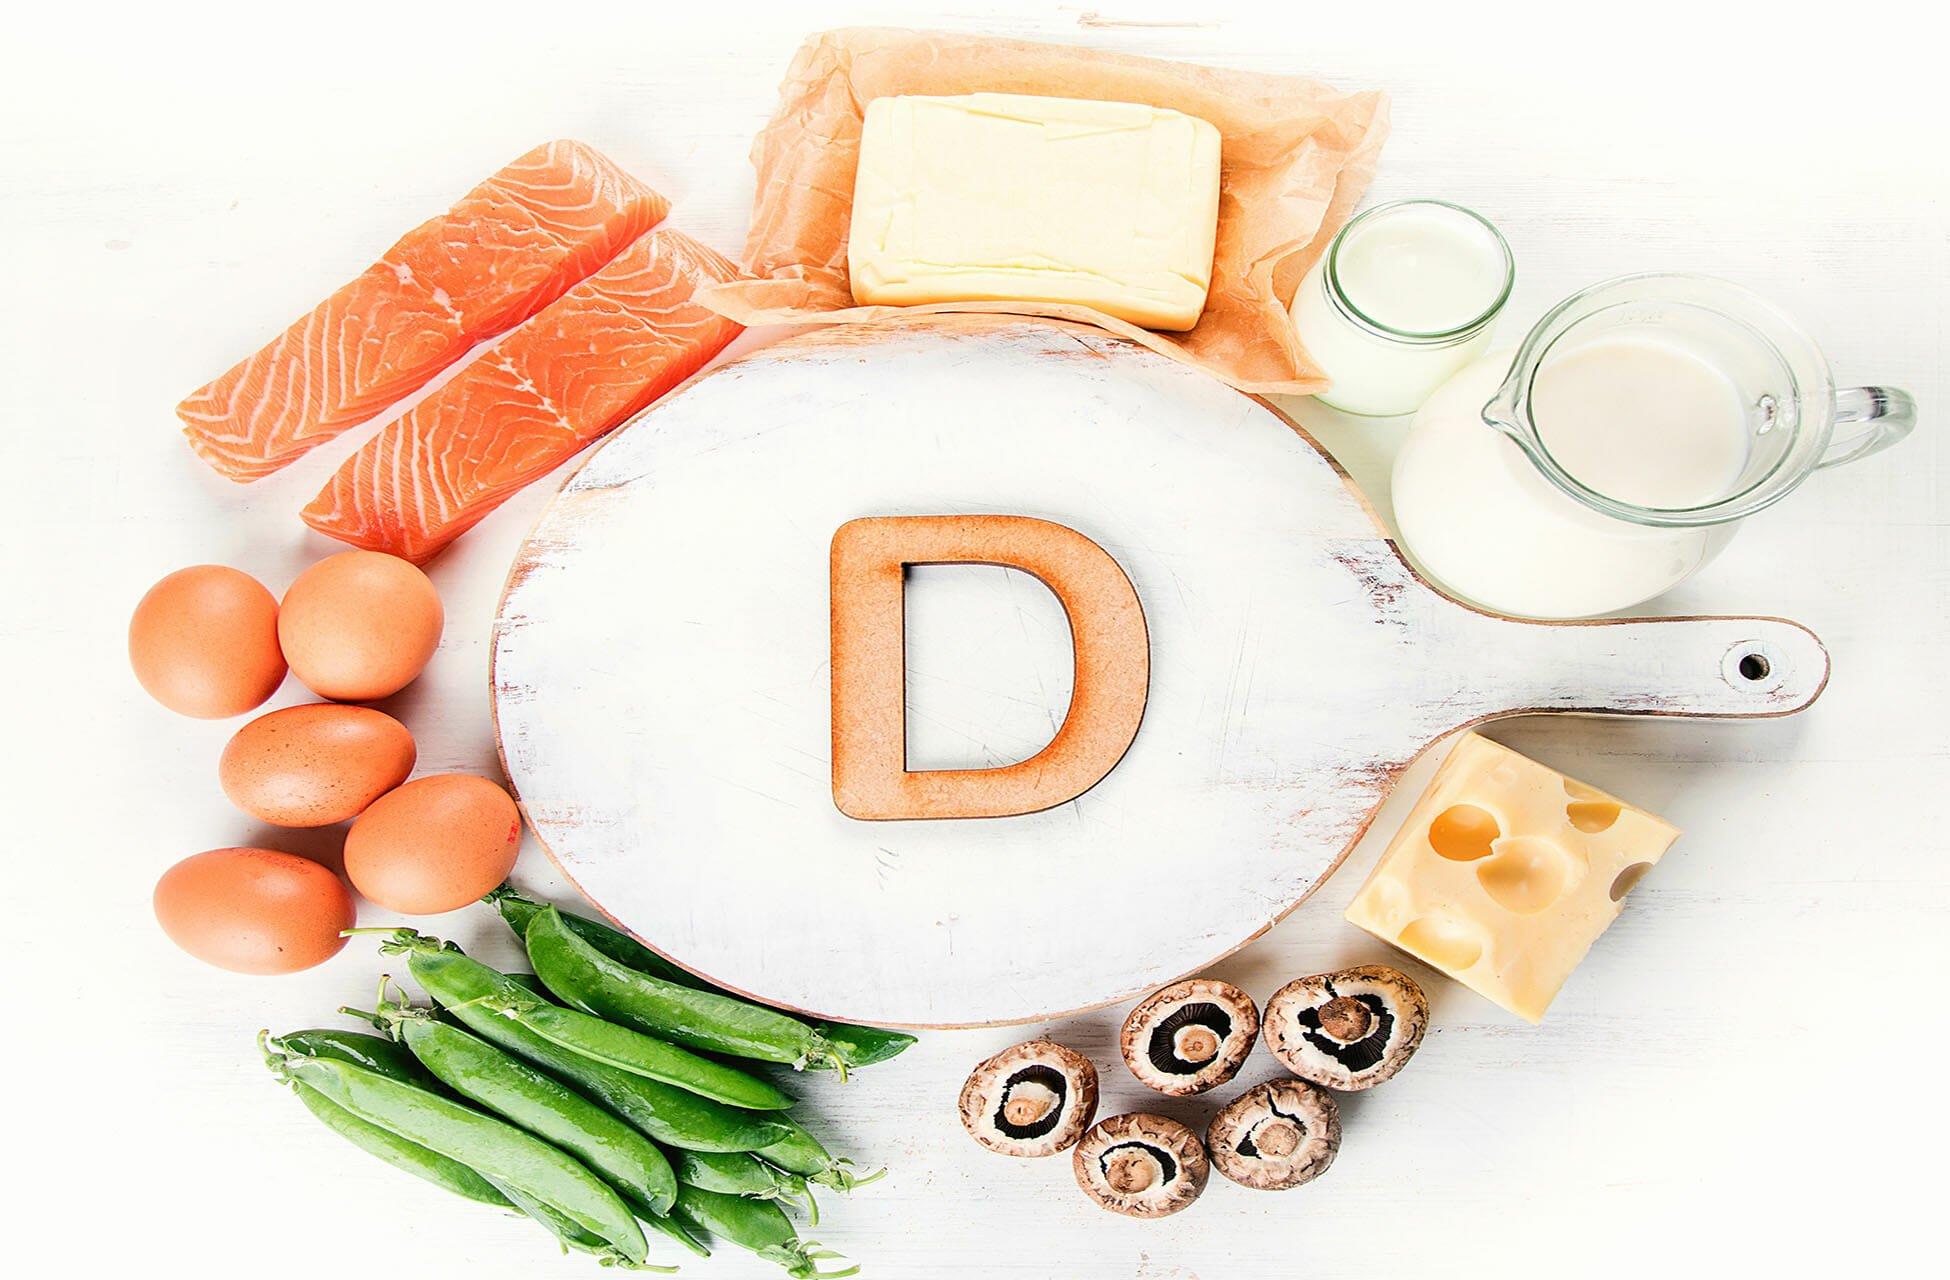 Витамин D предотвращает инфекции и снижает риск рака